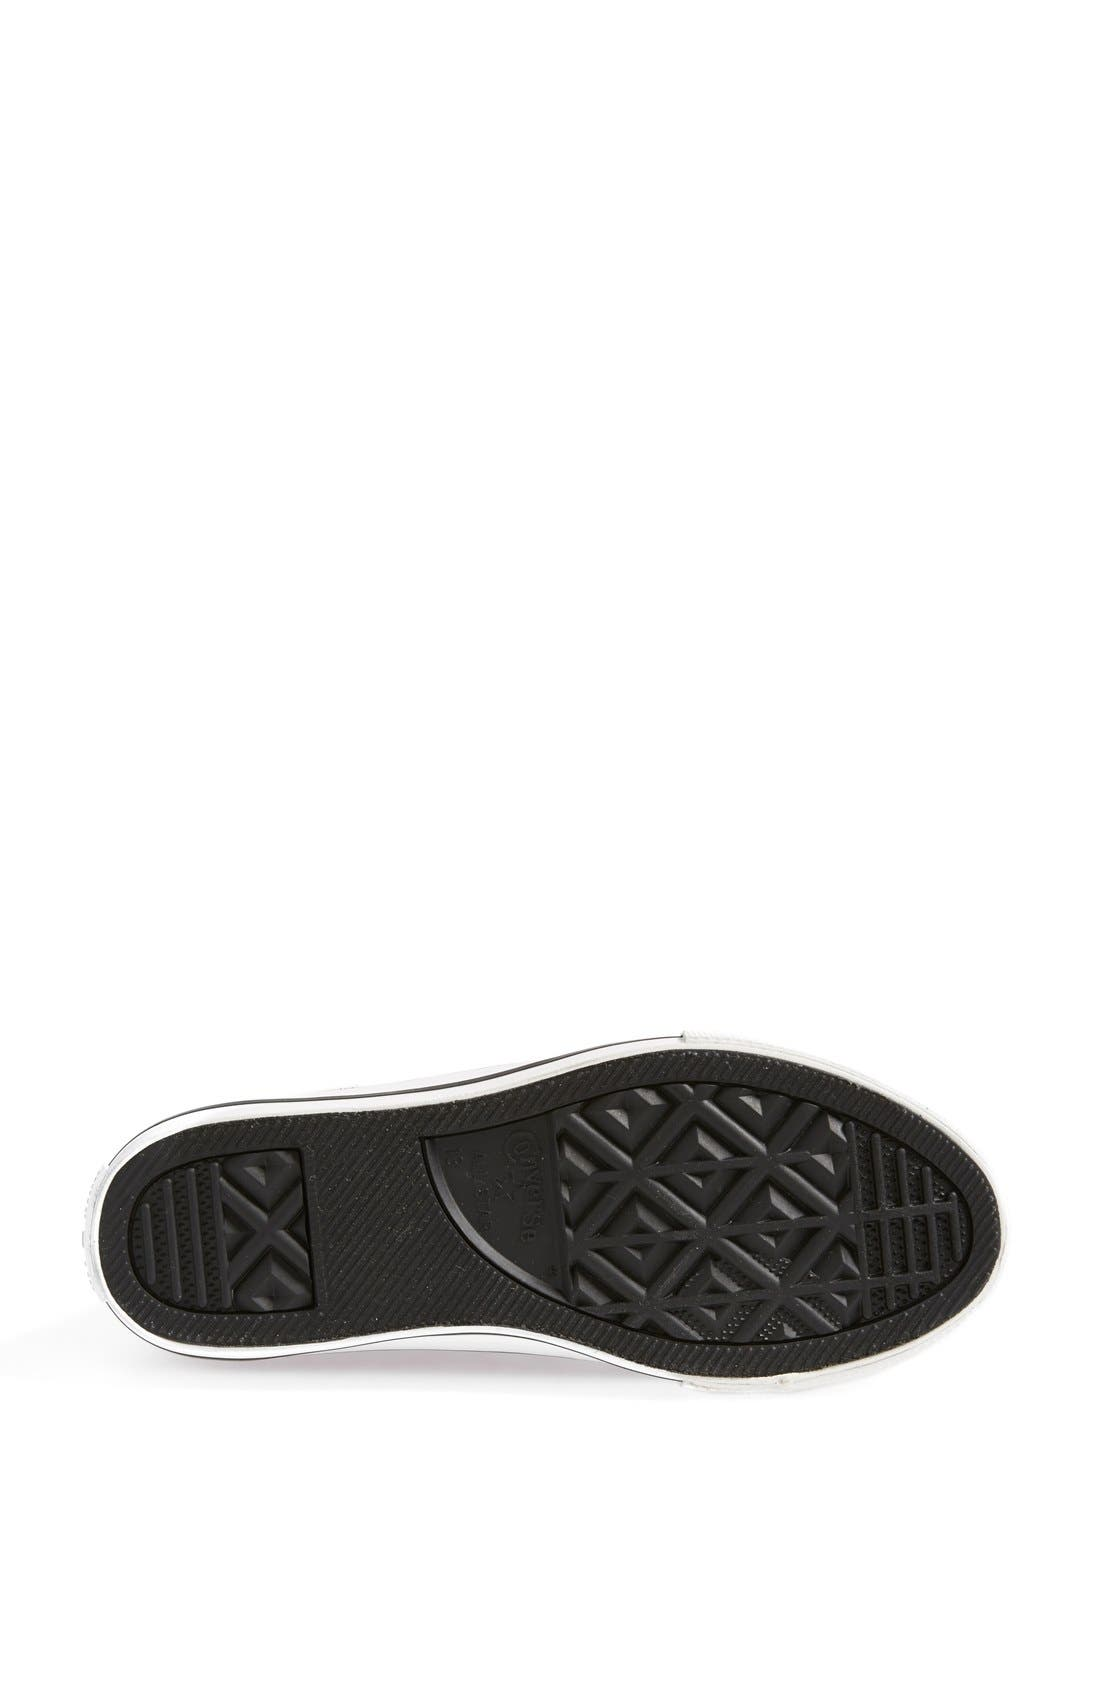 Alternate Image 4  - Converse Chuck Taylor® All Star® 'Sparkle Wash Boltz' High Top Sneaker (Toddler, Little Kid & Big Kid)